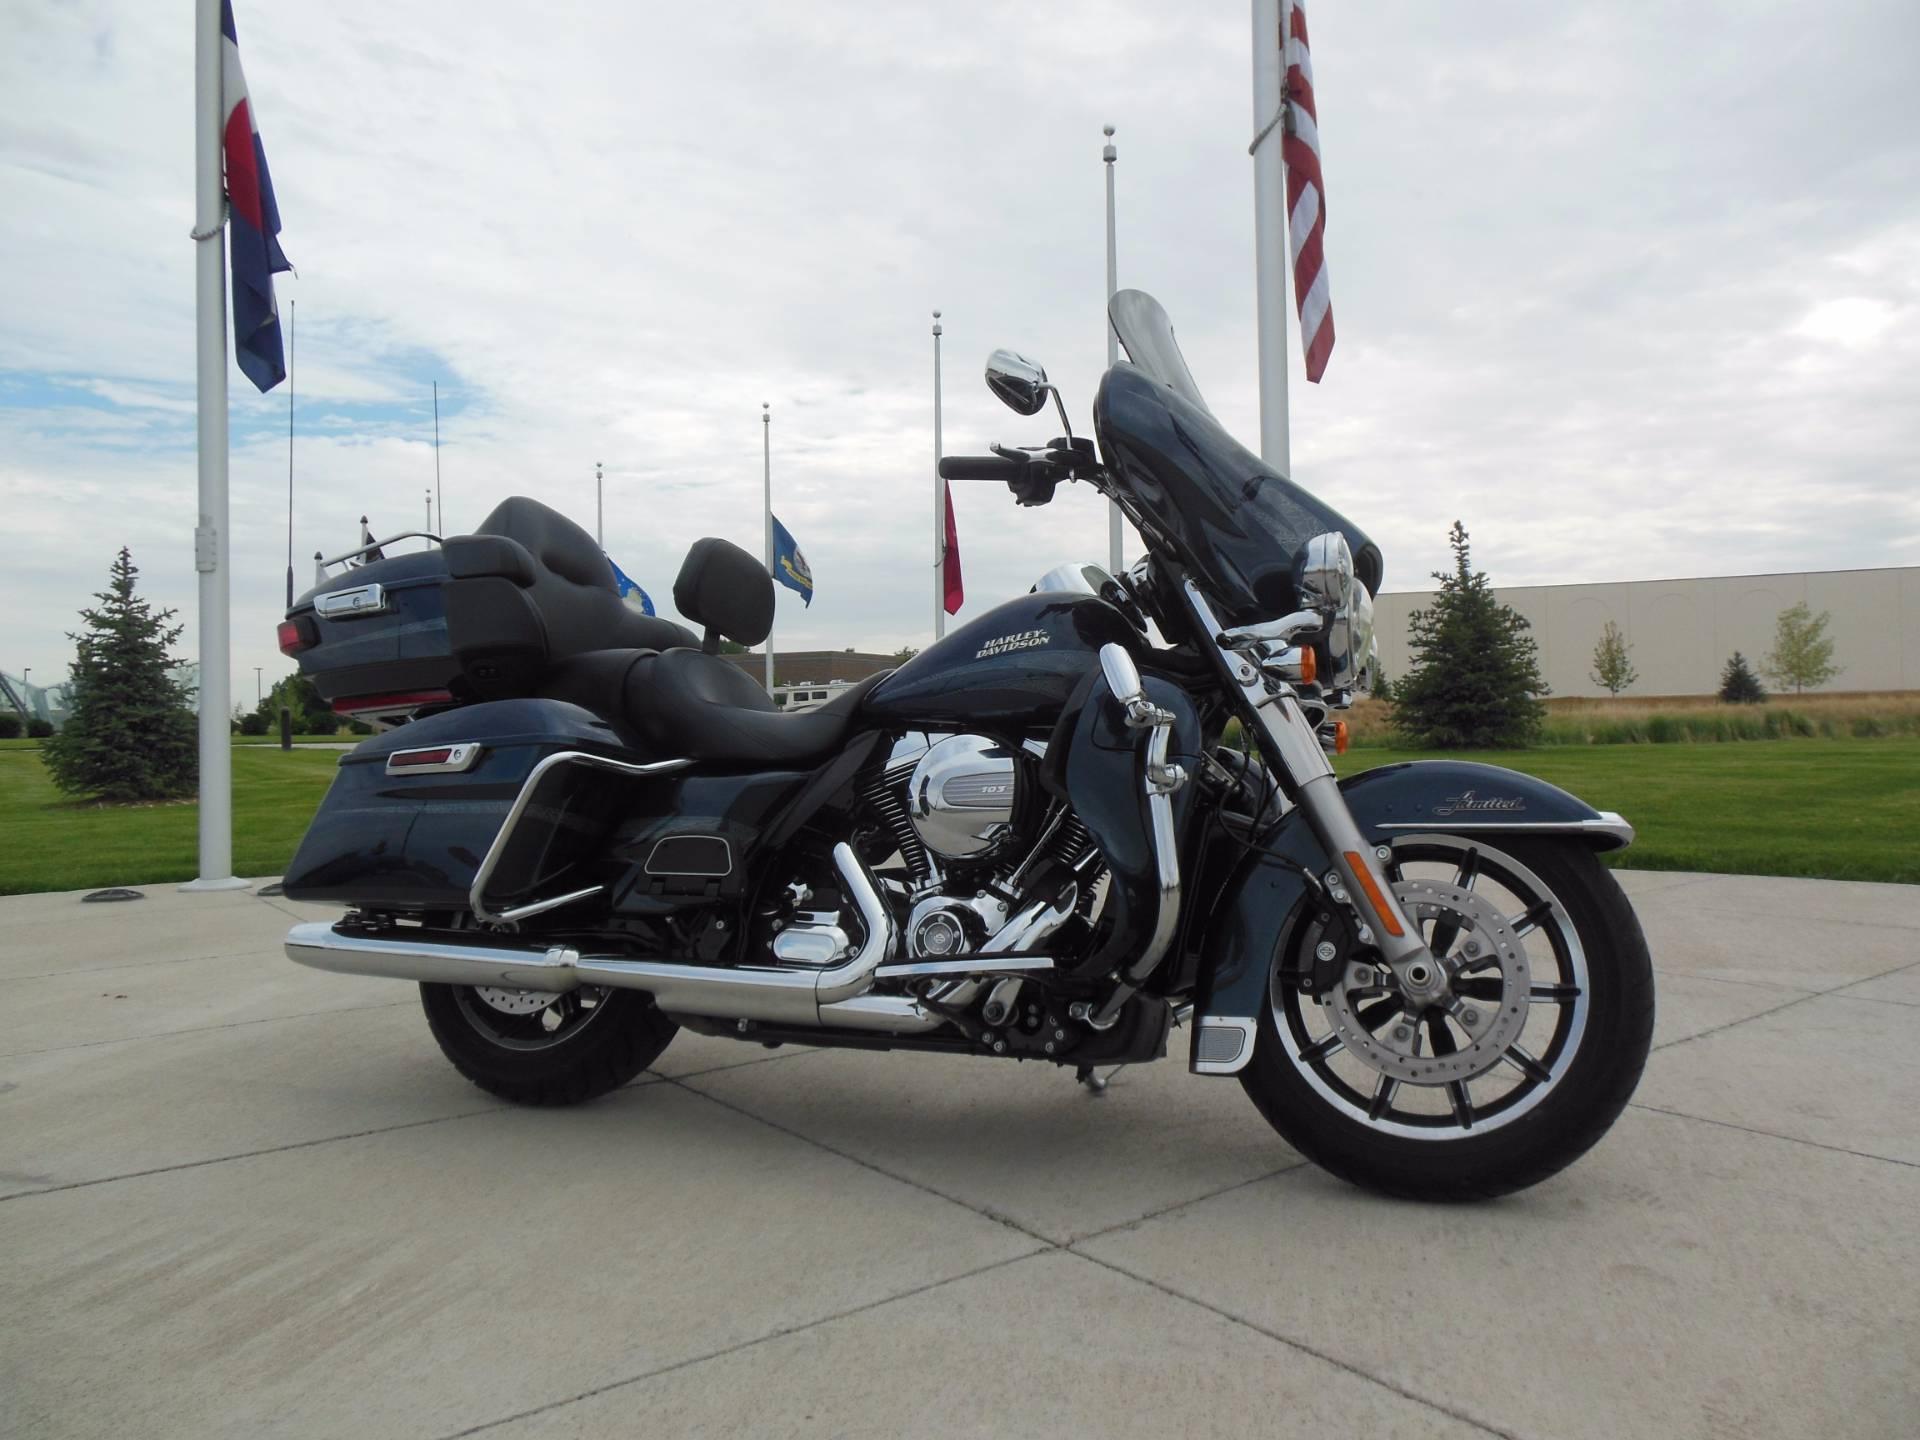 2016 Harley Davidson Ultra Limited In Aurora Colorado